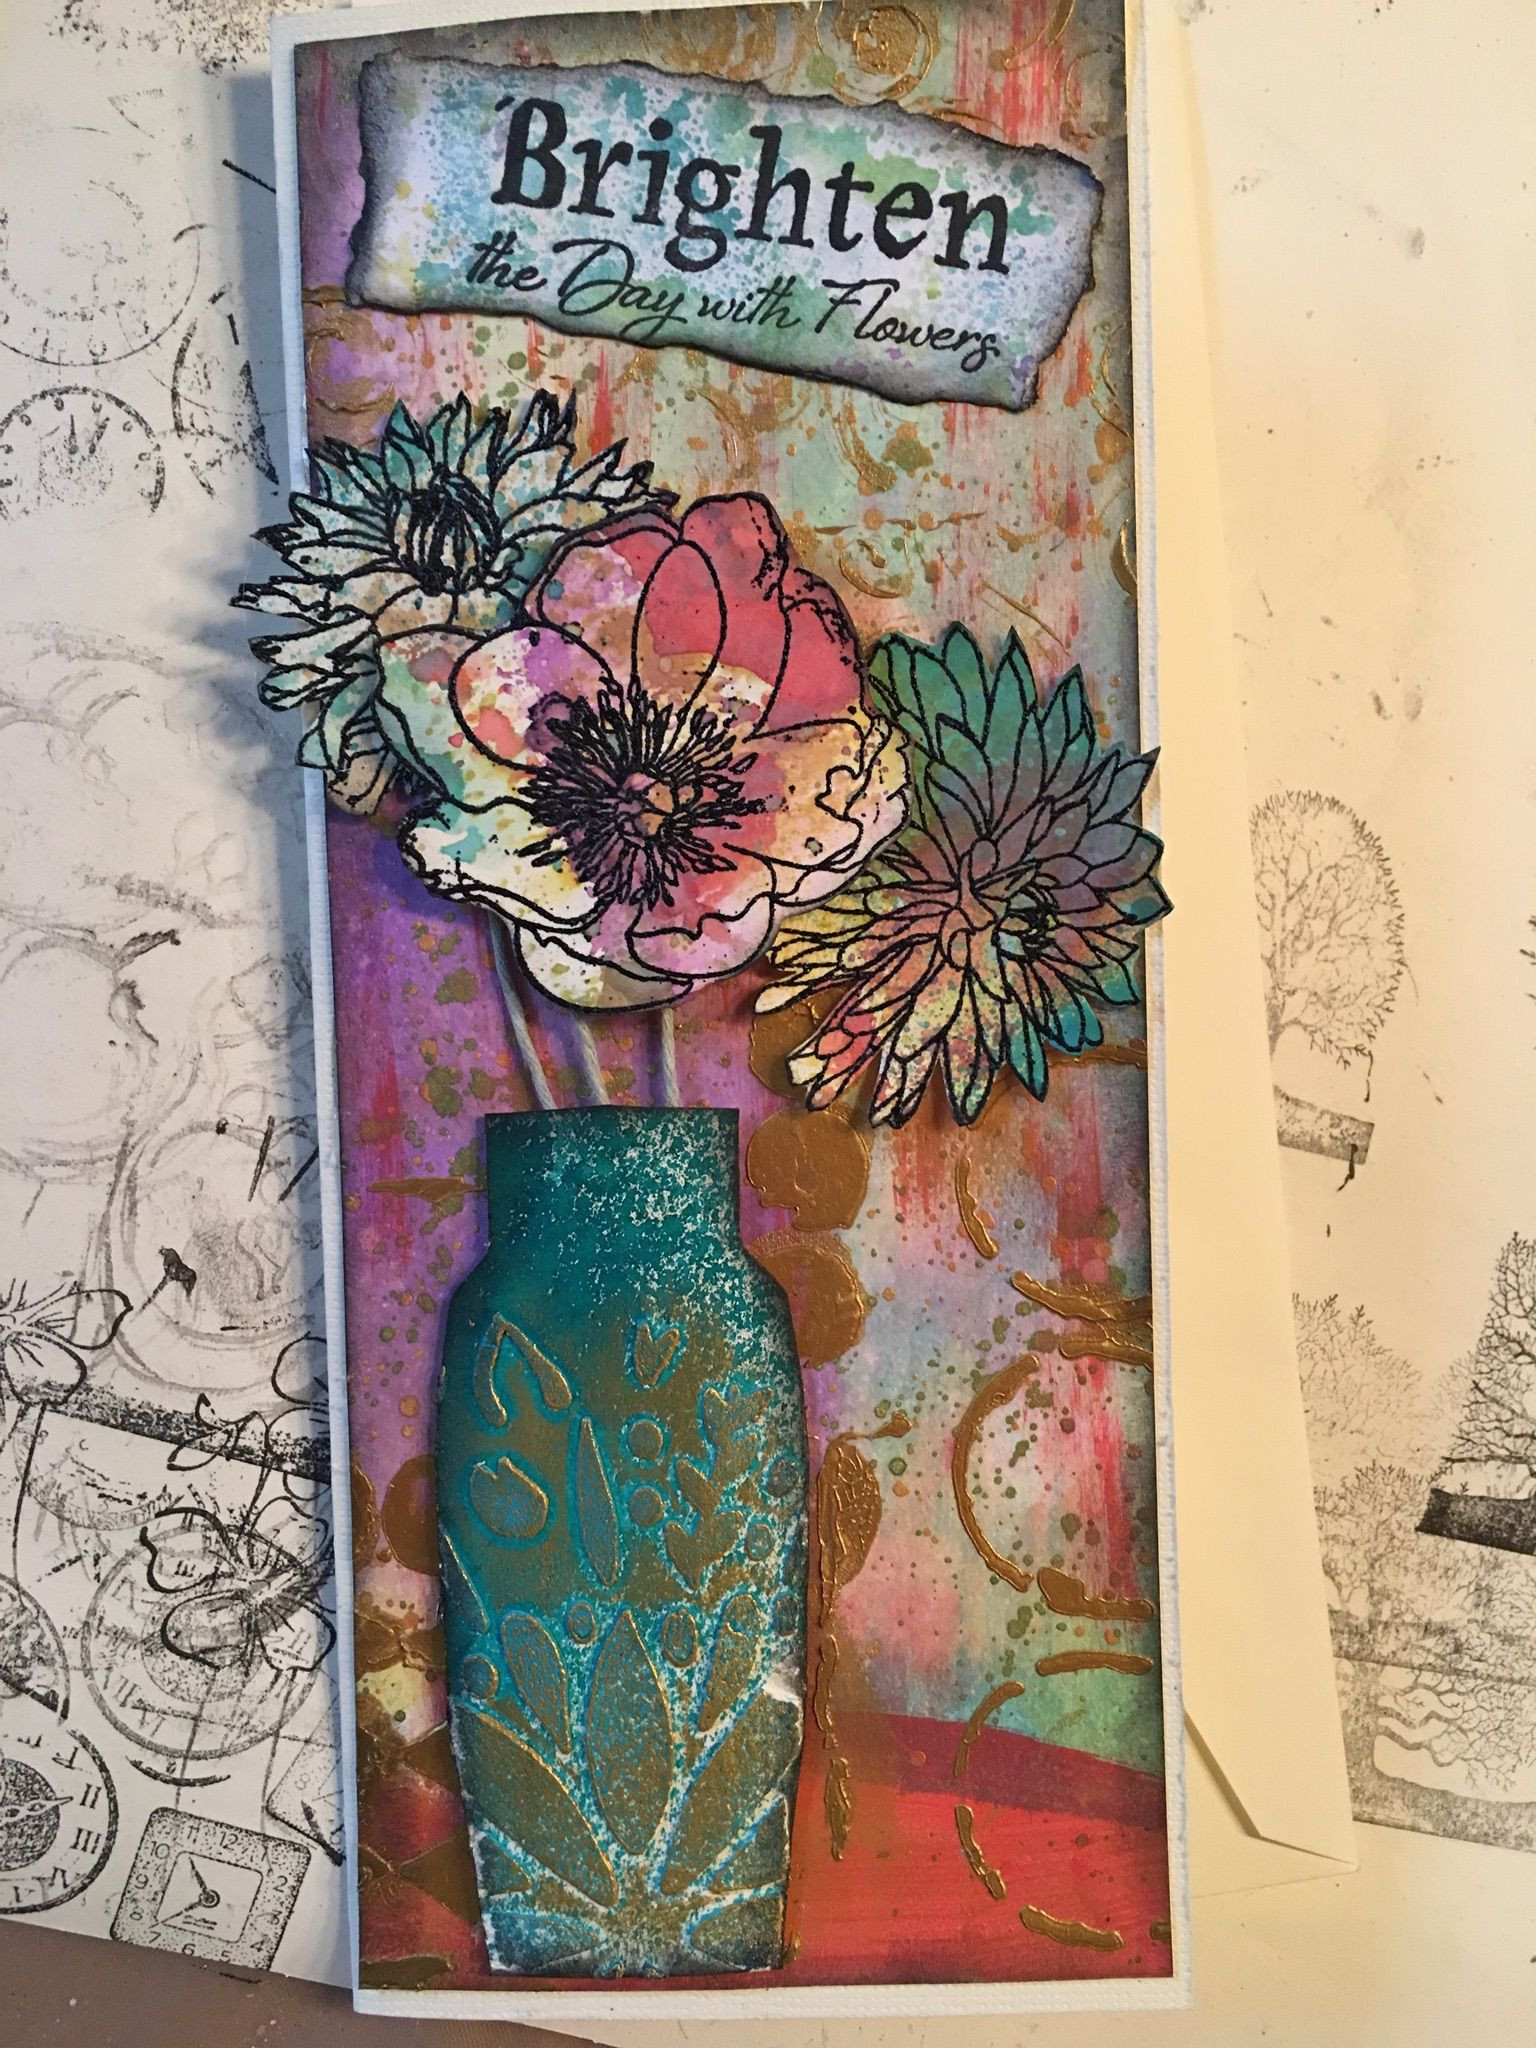 teal flower vase of birthday card vase with flowers rickis handmade cards pinterest intended for birthday card vase with flowers